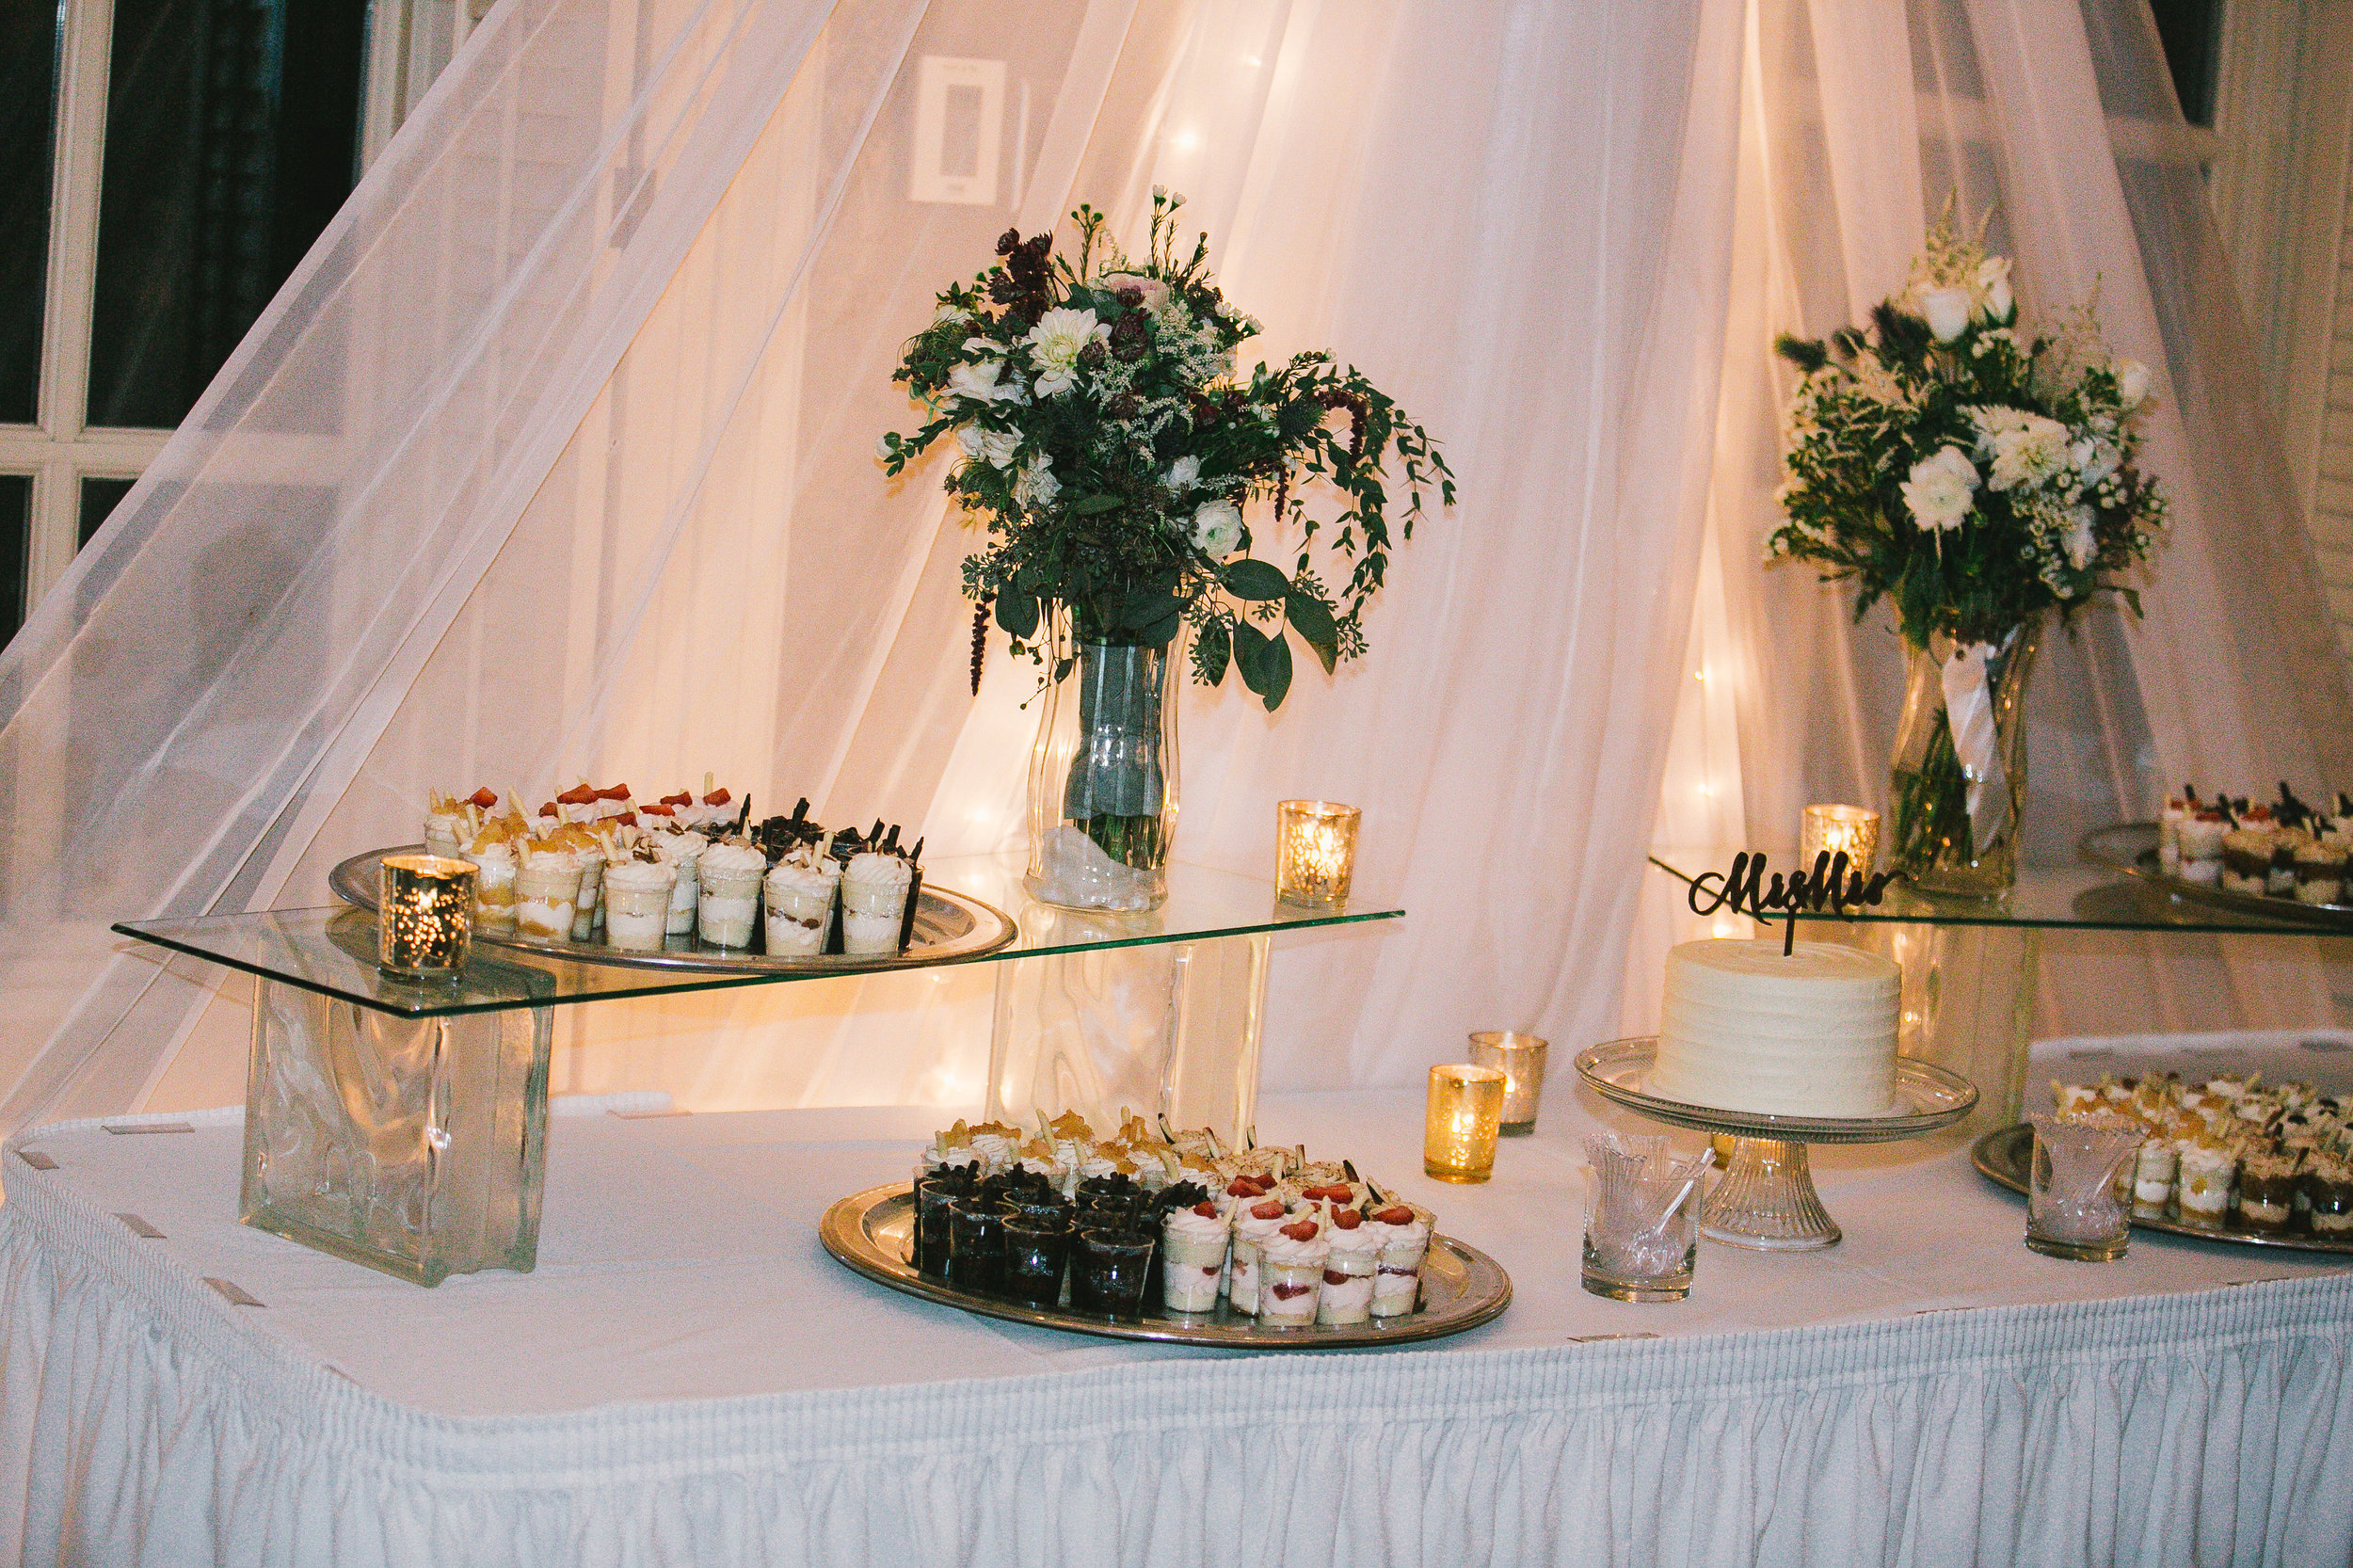 kim-nate-wedding-767 - Copy.jpg